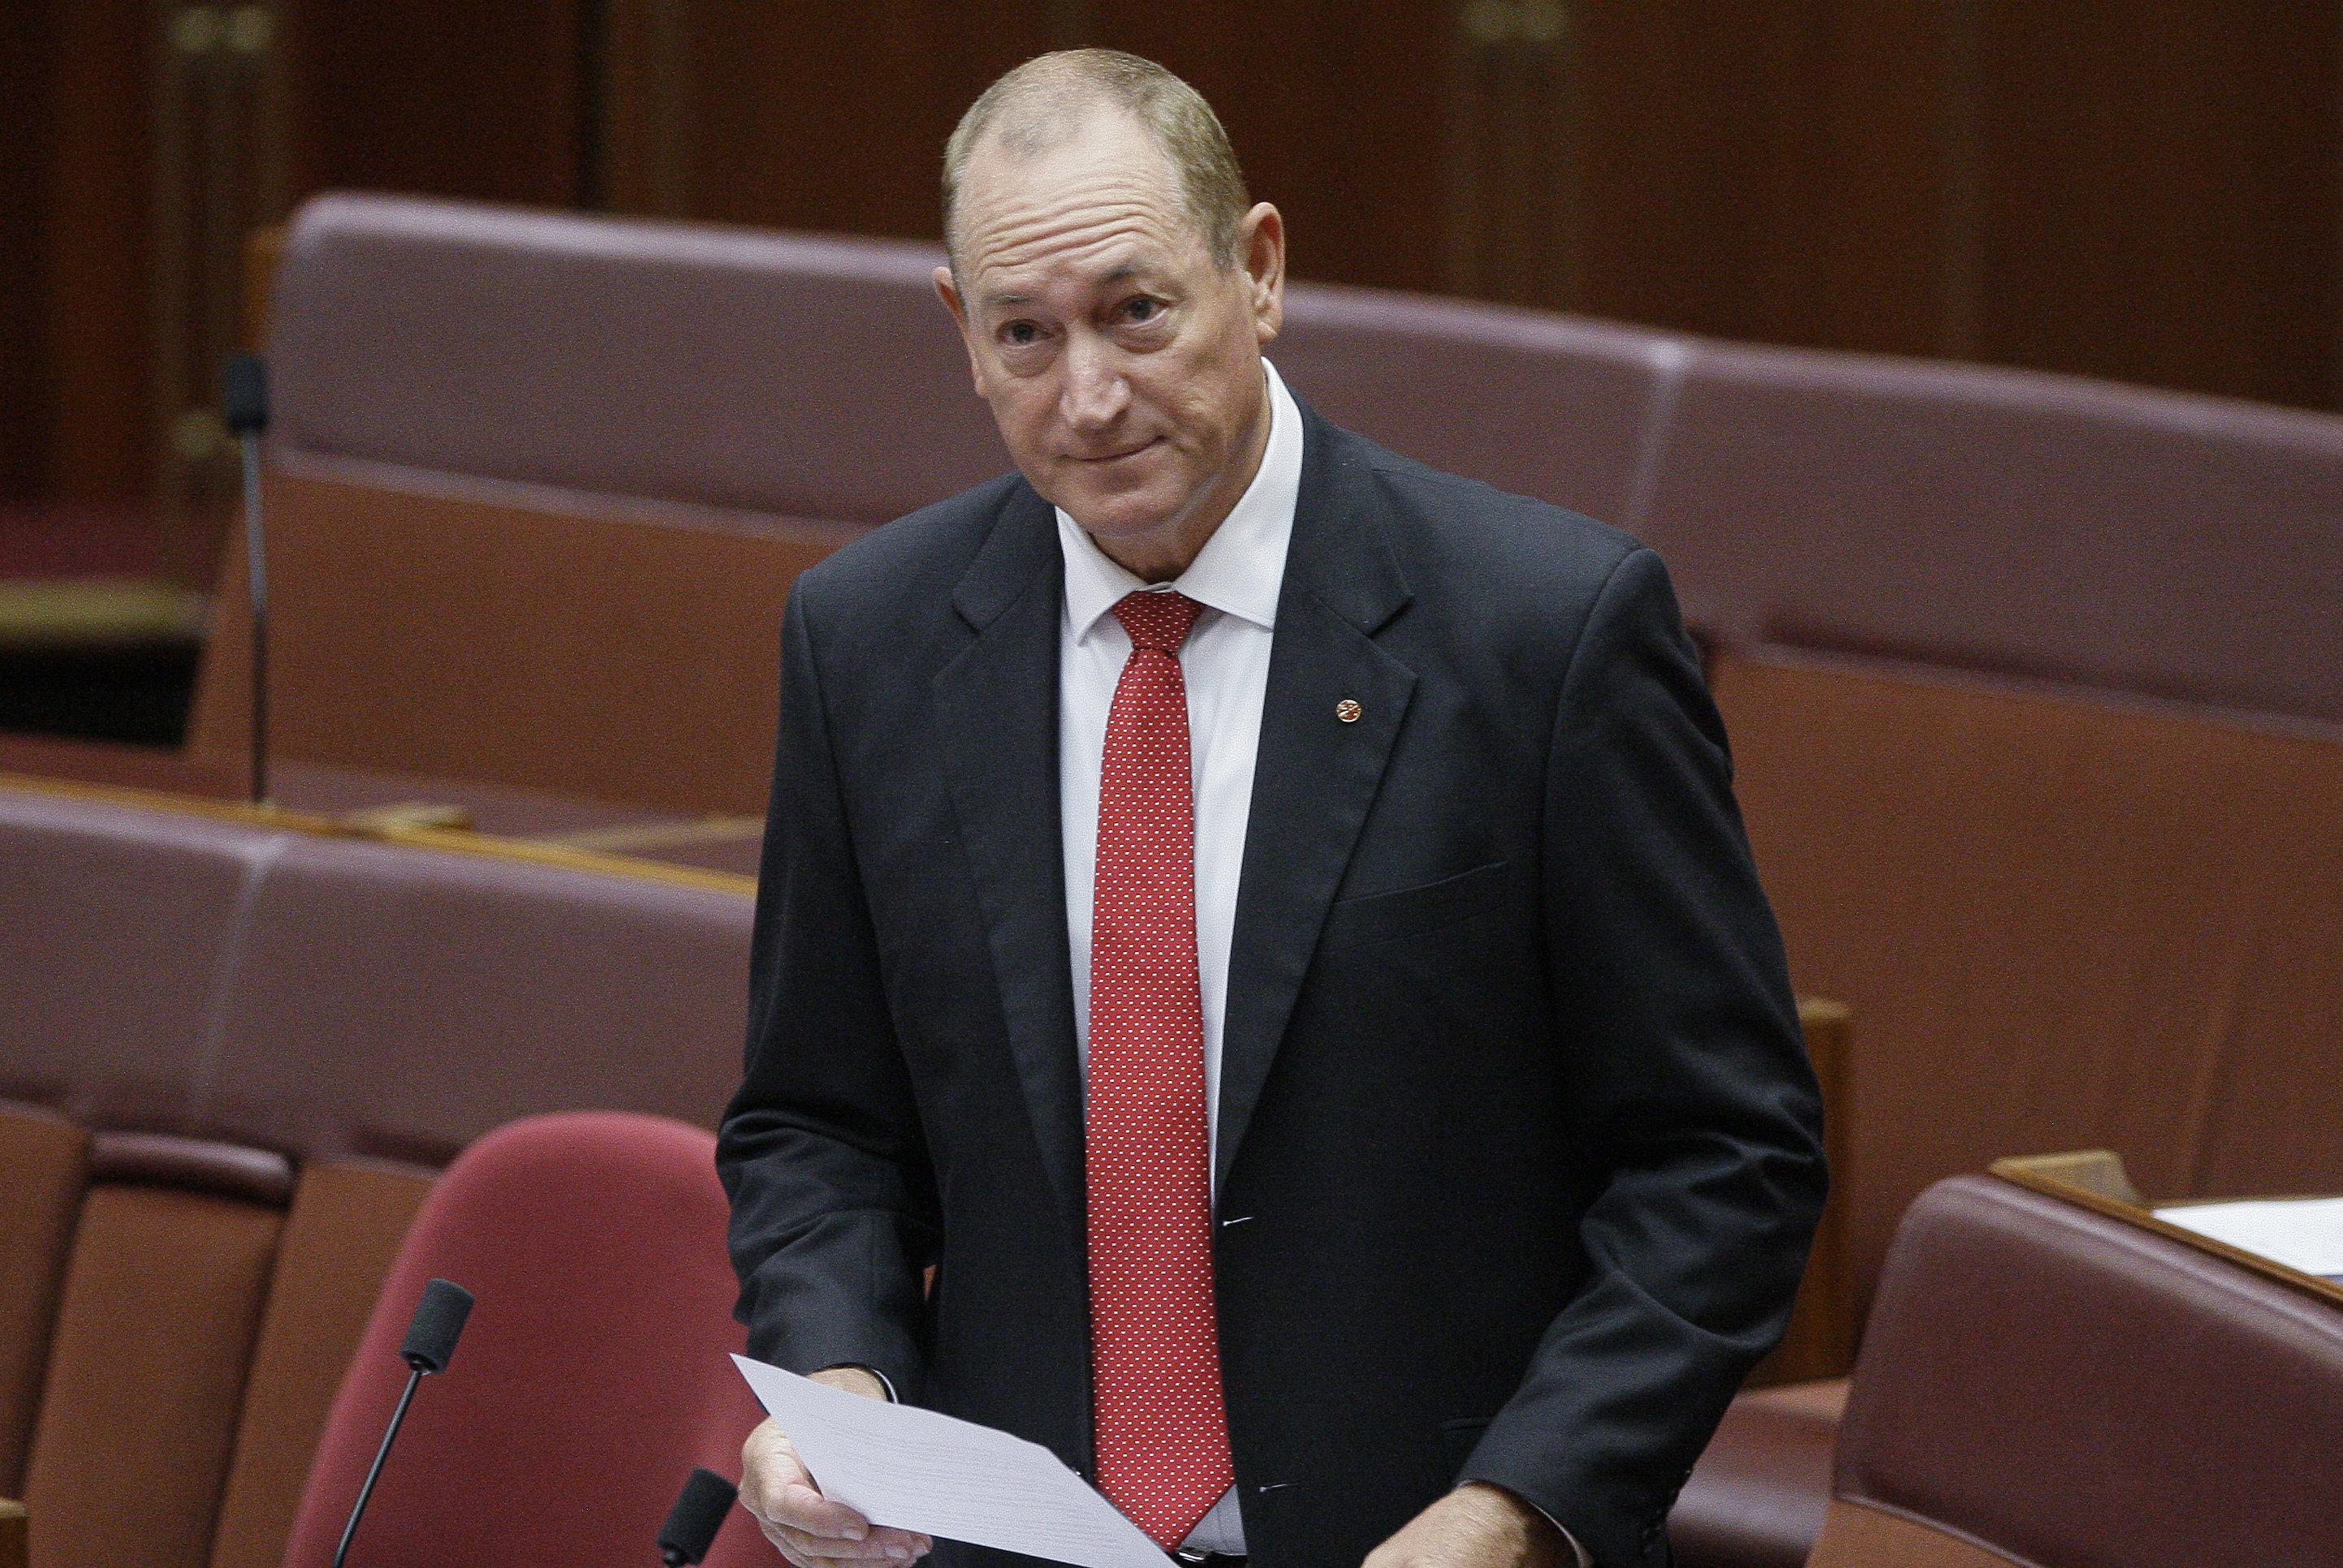 Australian Senator Fraser Anning gives a speech in Parliament House in Canberra, Australia, Wednesday, April 3, 2019.